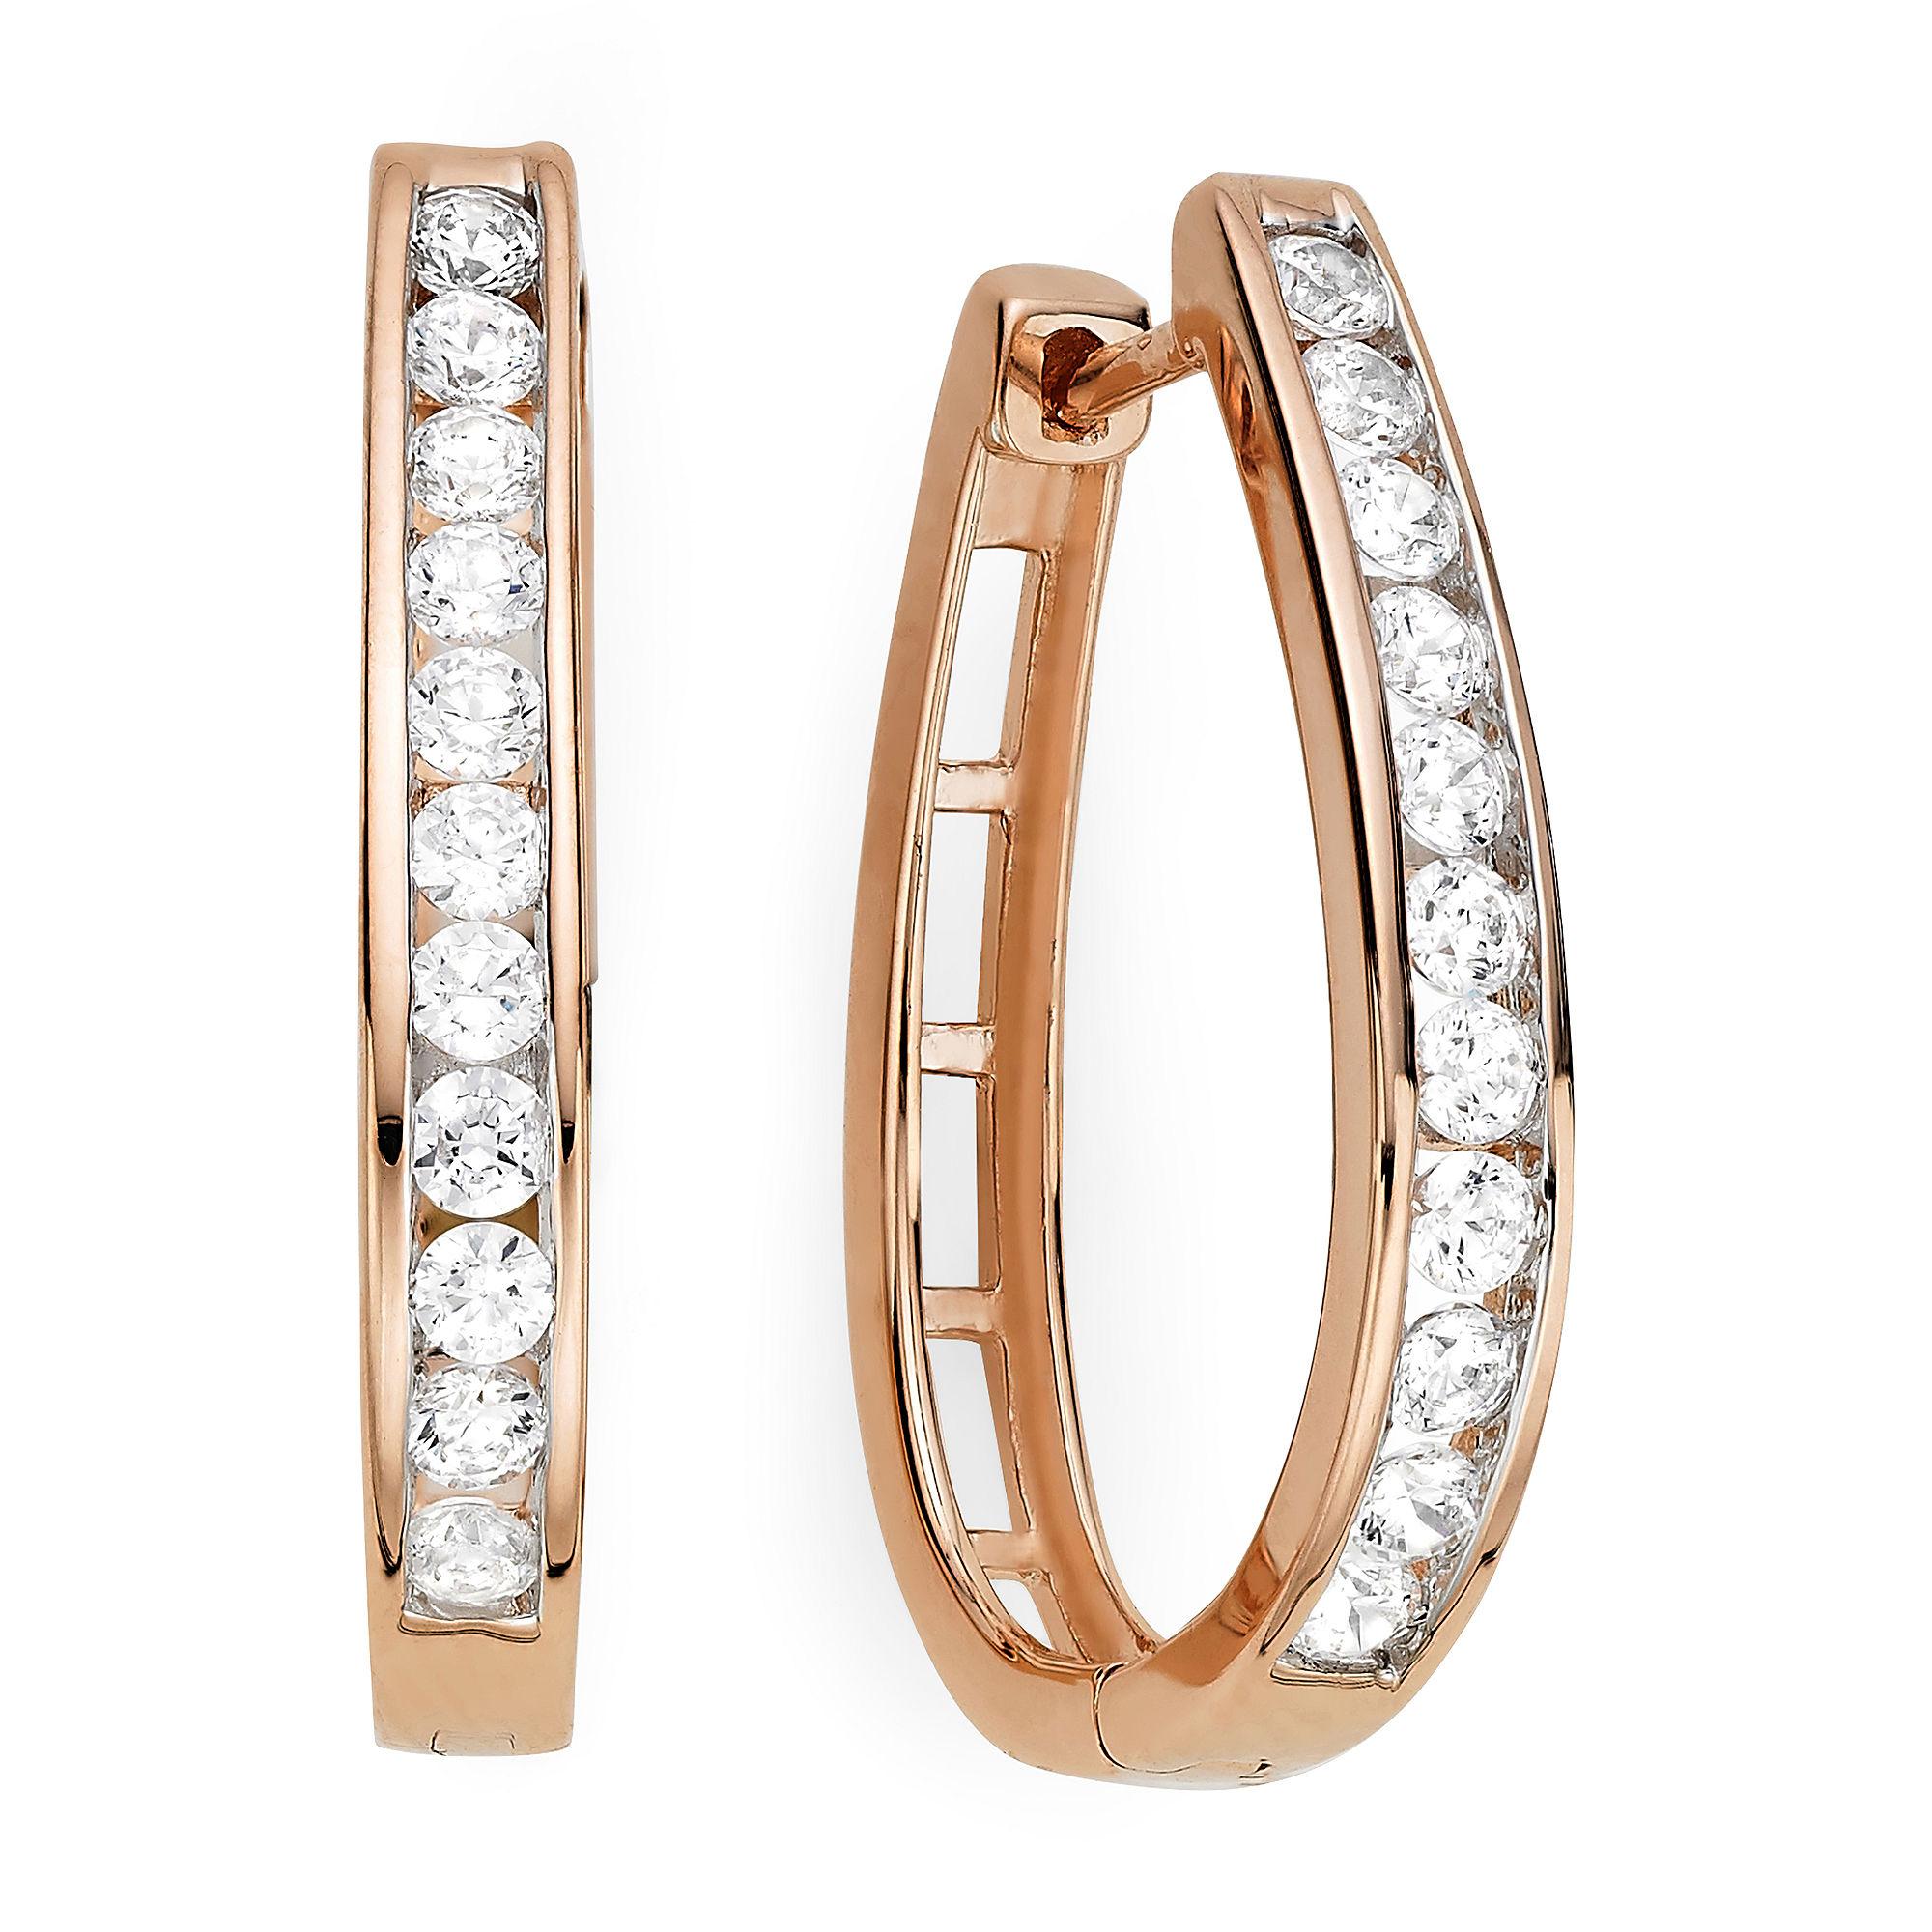 1 CT. T.W. Diamond 14K Rose Gold Over Sterling Silver Hoop Earrings